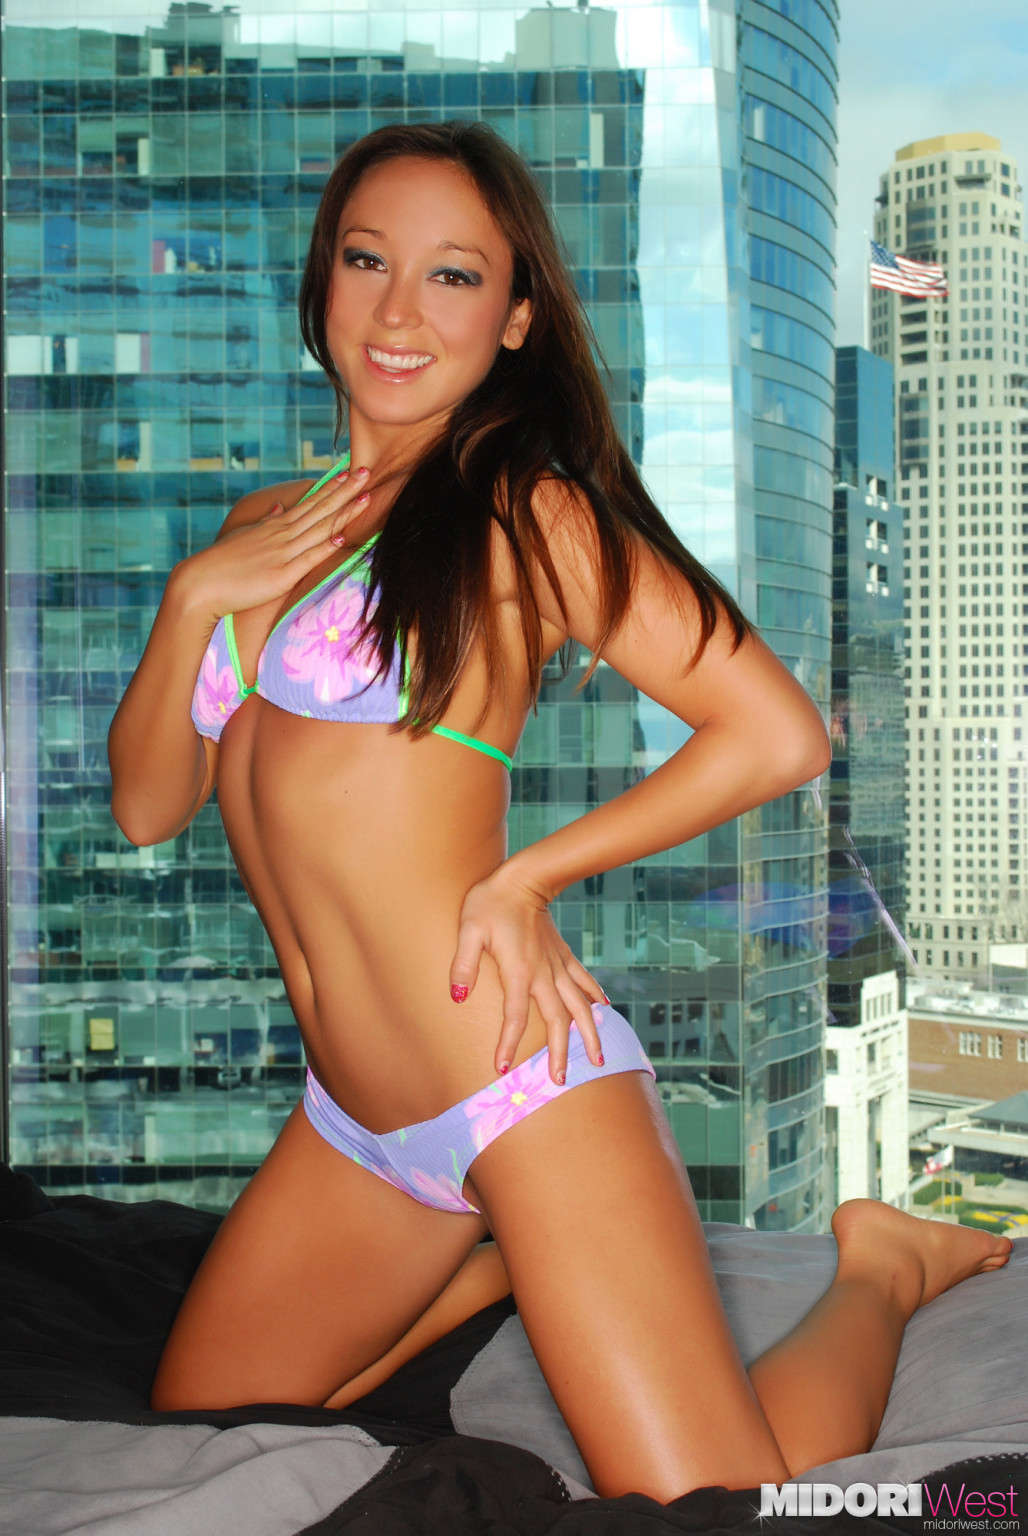 Midori west action  bikini erotic dancing by the window